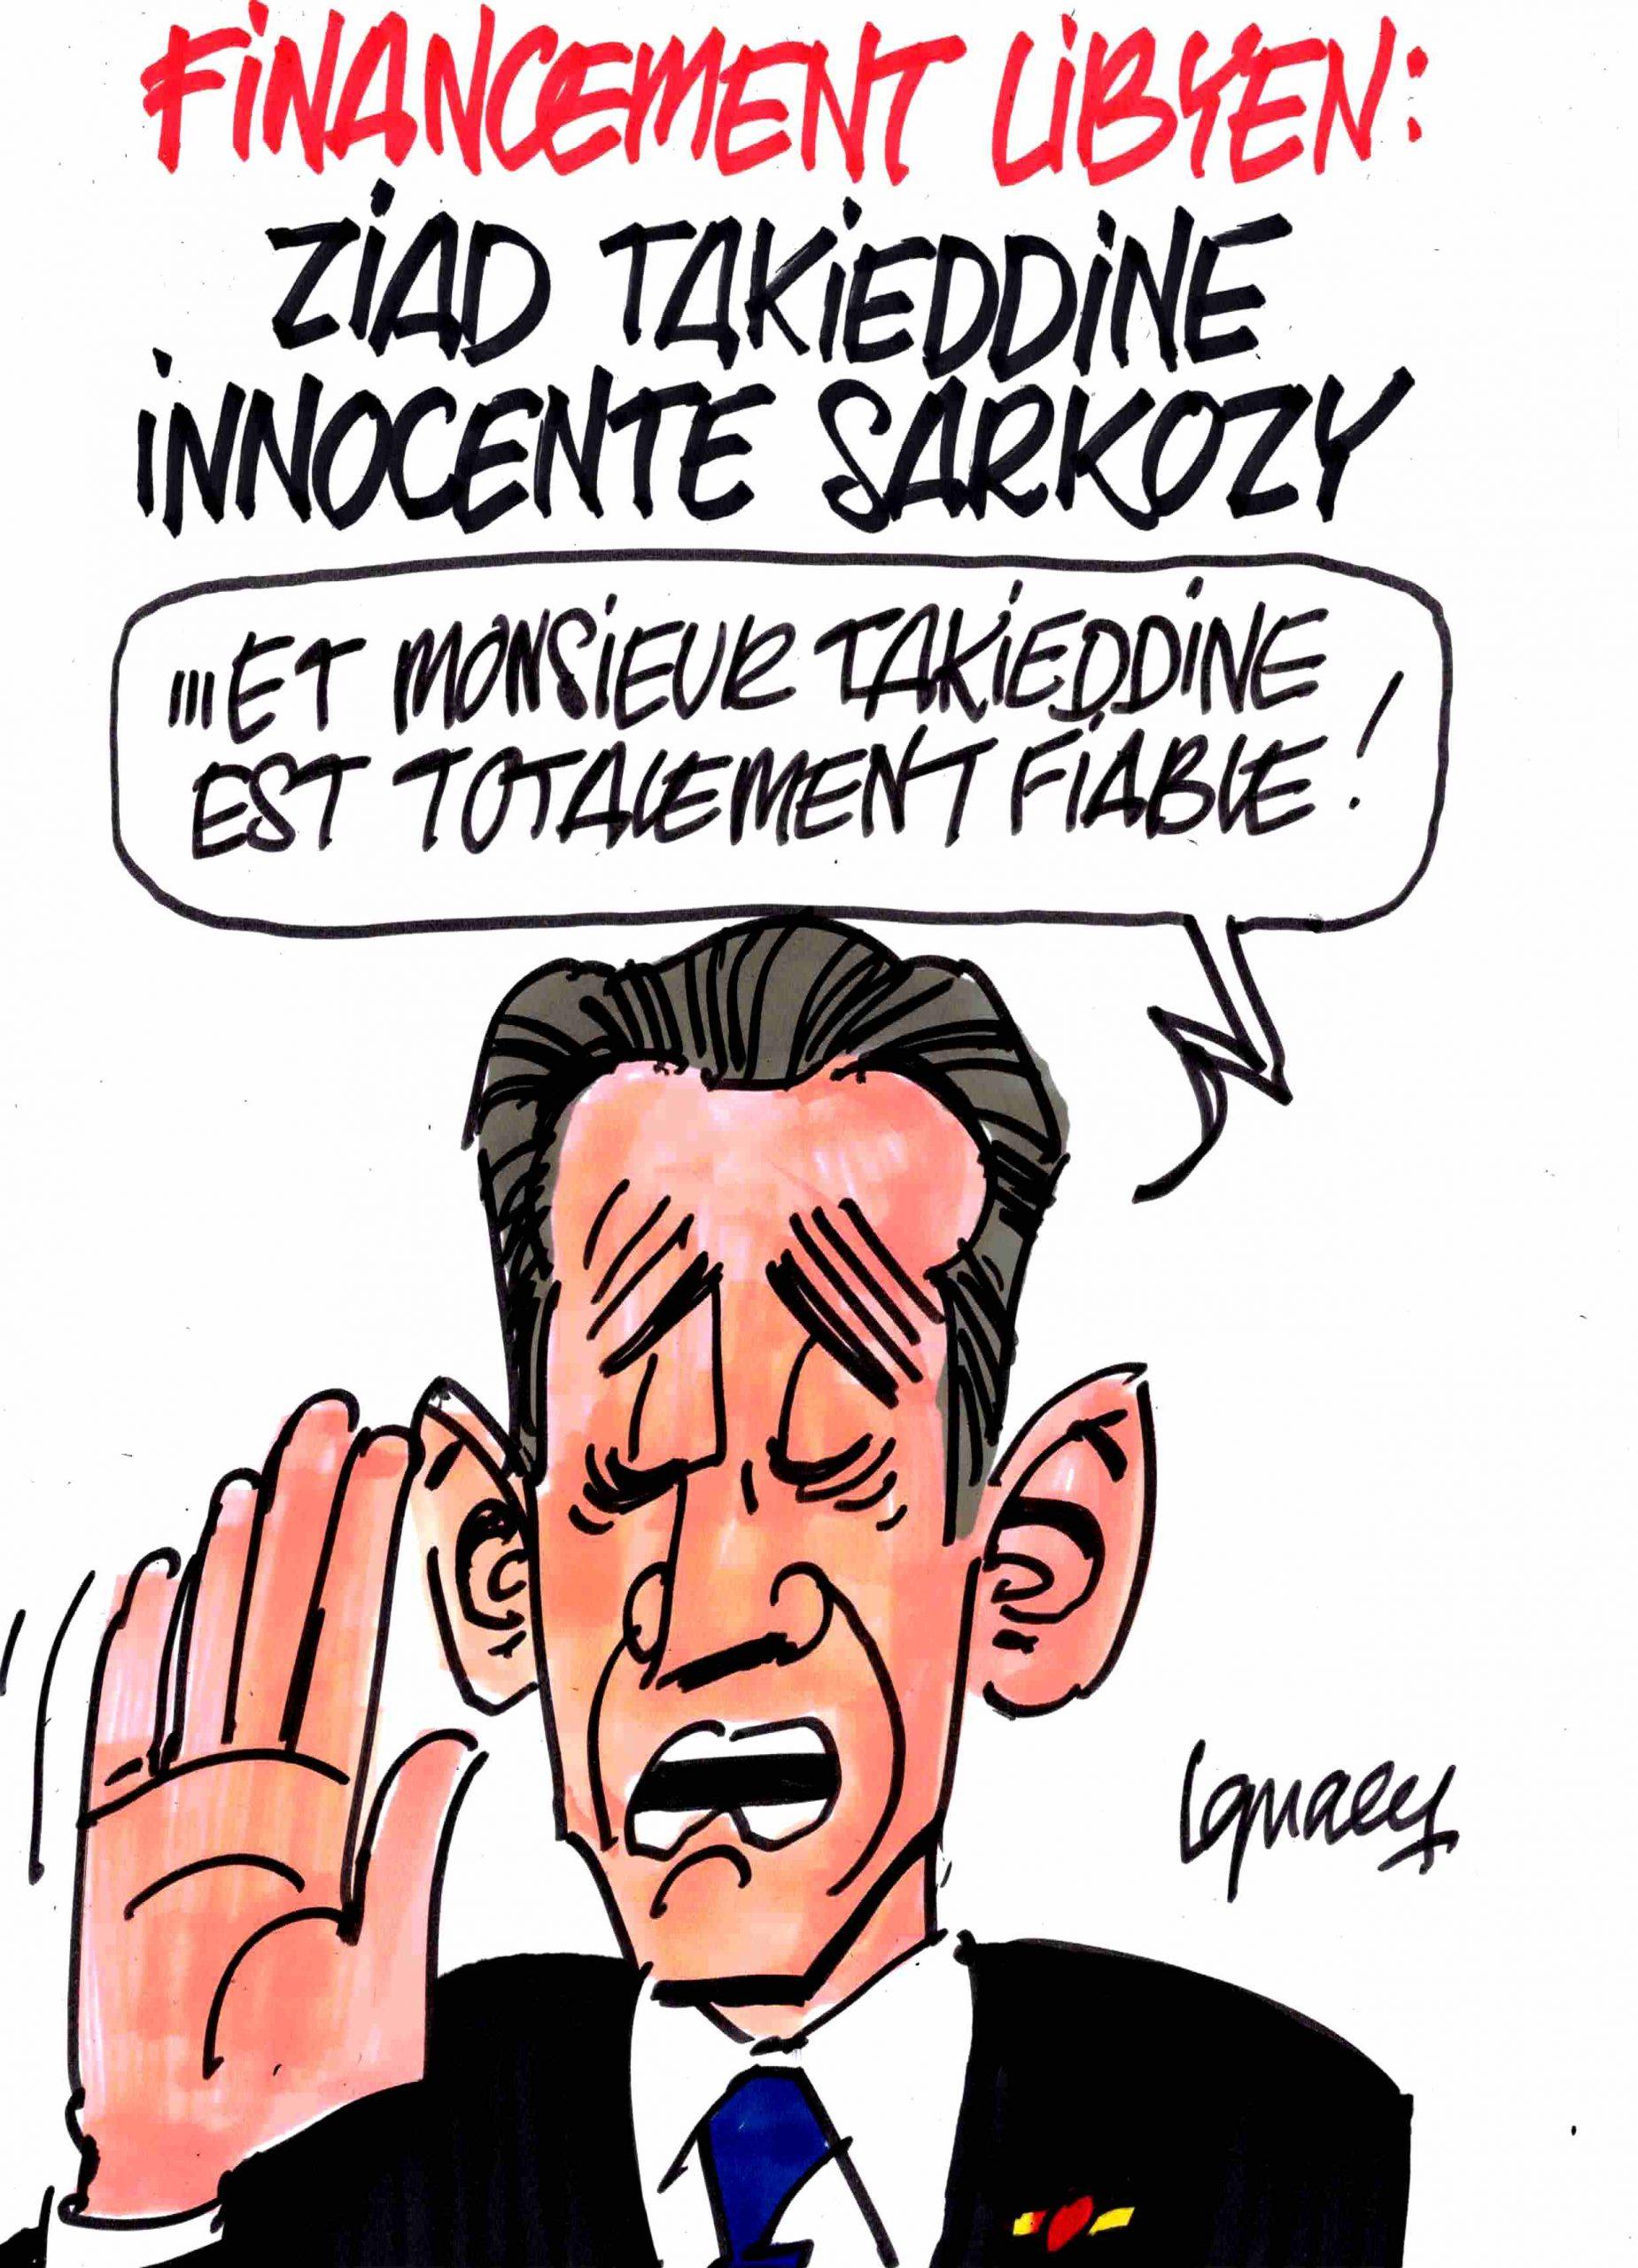 Ignace - Takieddine innocente Sarkozy